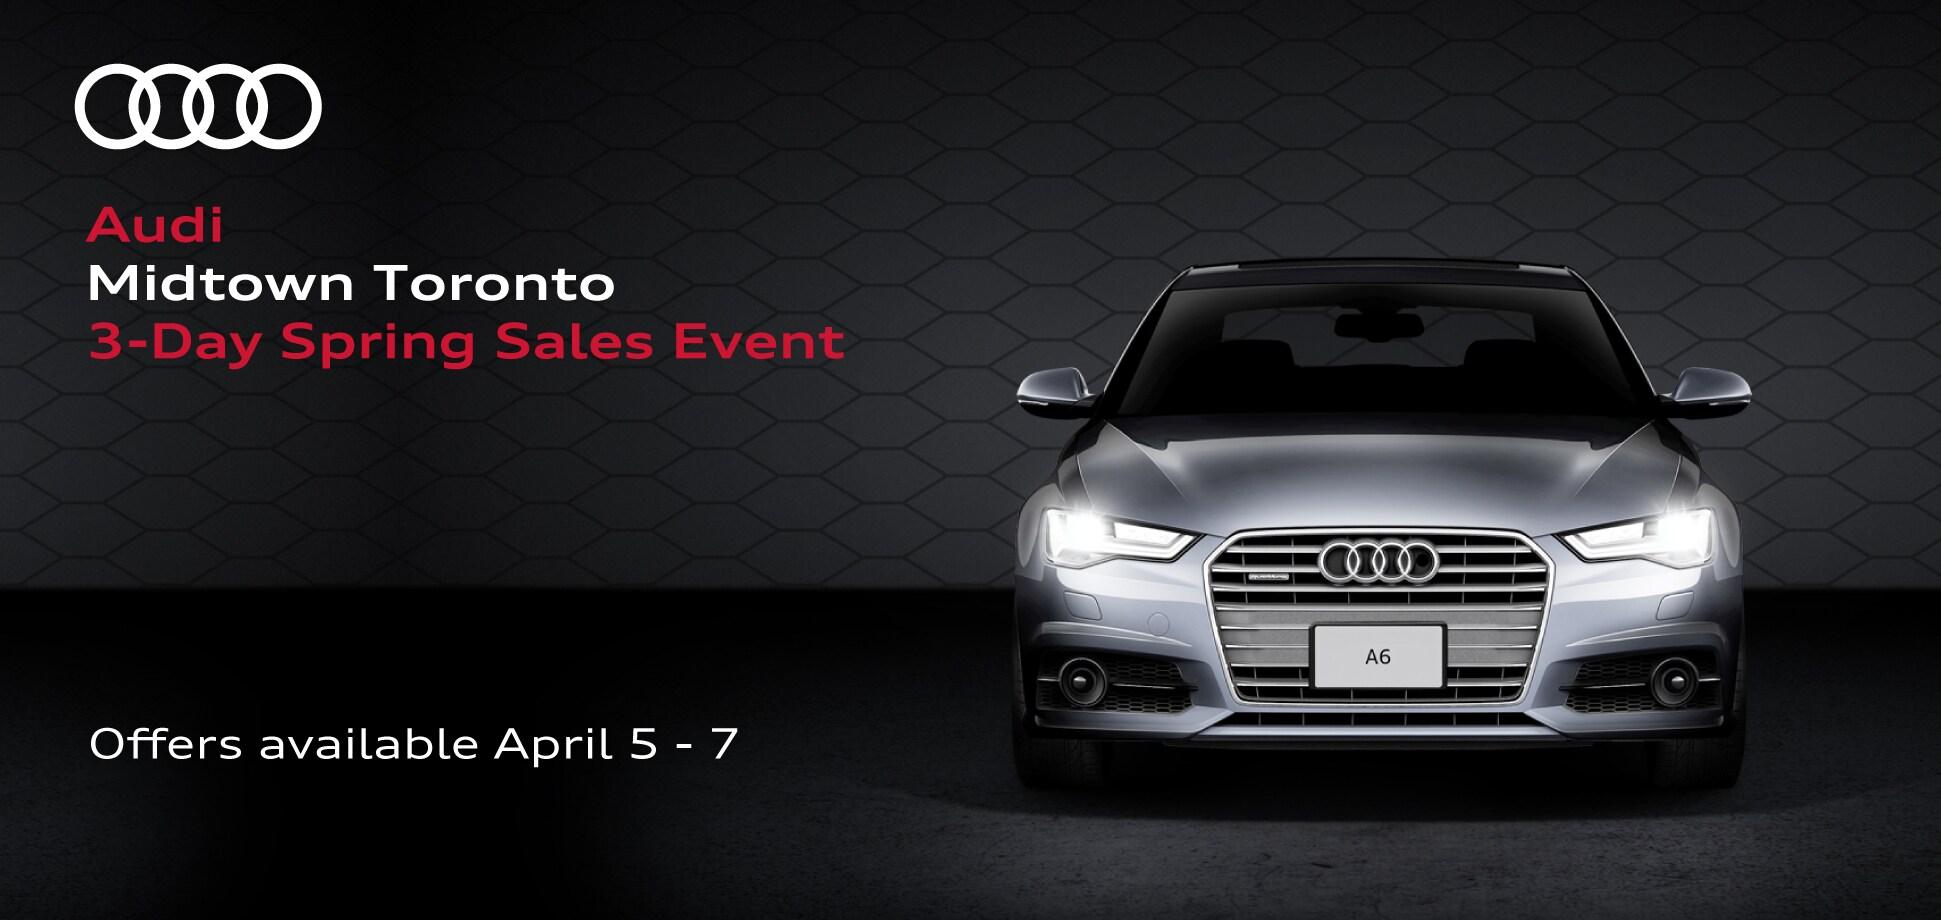 Audi Midtown Toronto New Audi Dealership In Toronto ON MJ R - Day audi